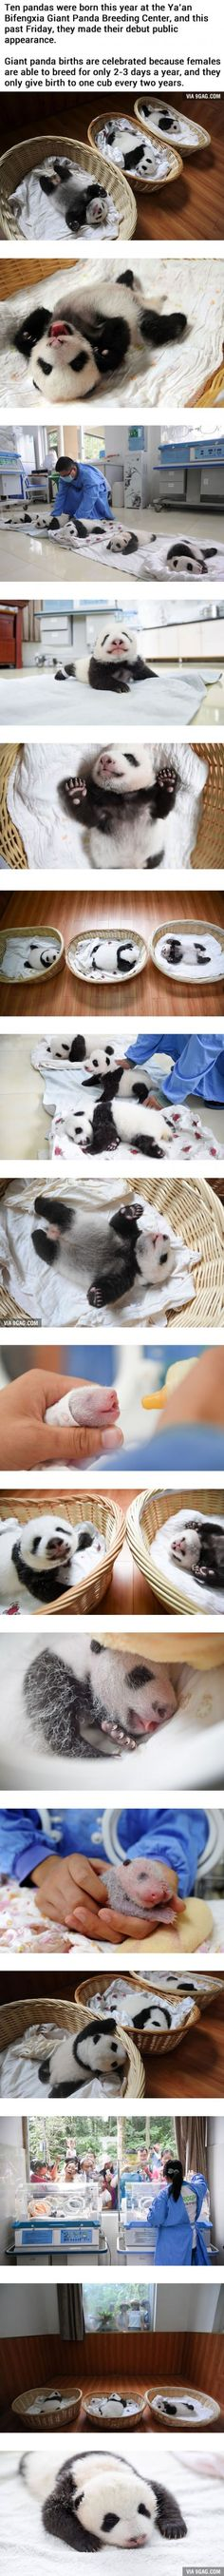 Newborn Panda Babies Say Their First Hello At Chinese Panda Breeding Center